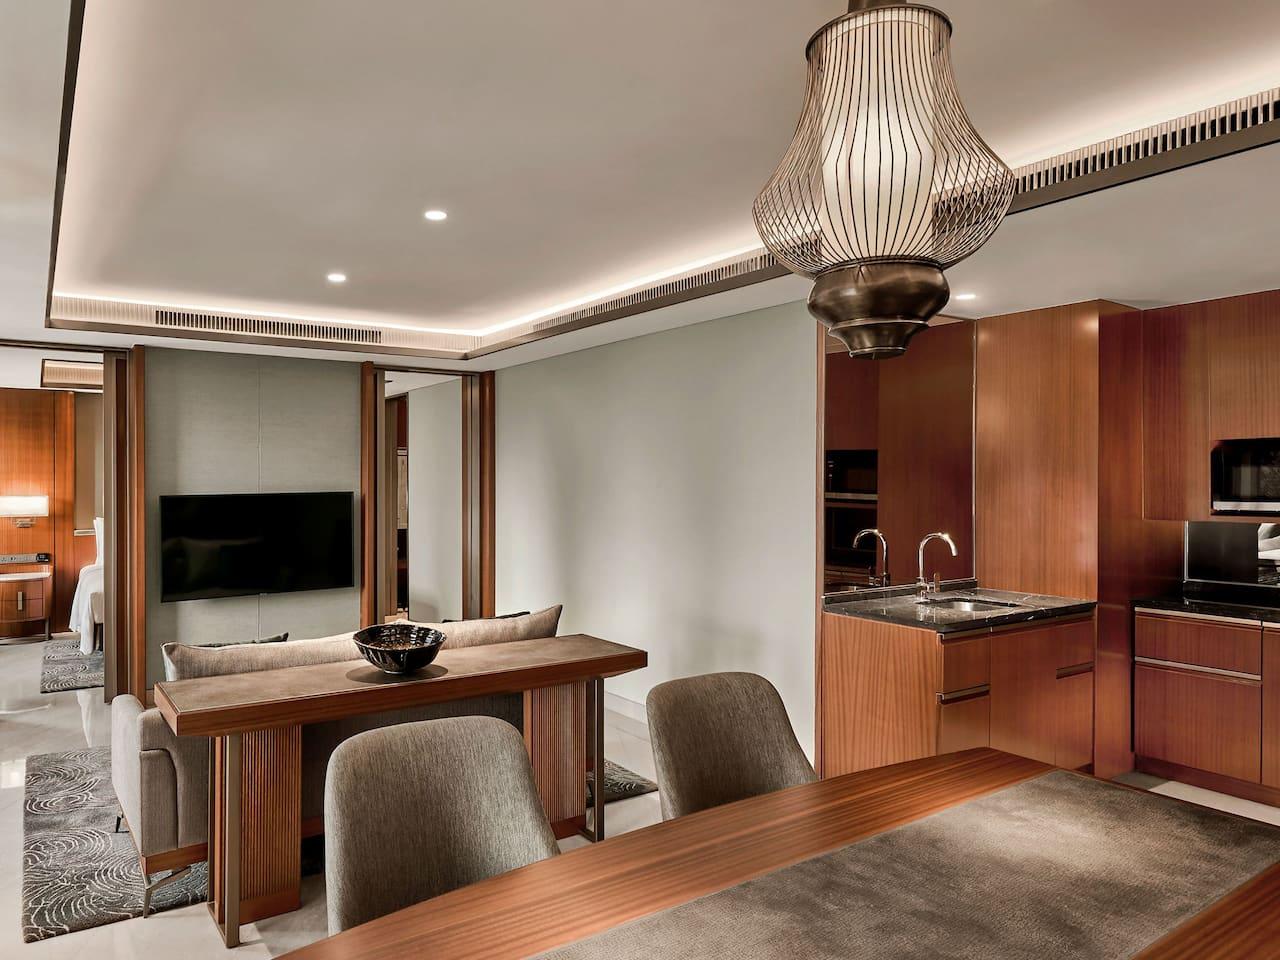 Grand Suite Dining and Kitchen, Luxury Hotel Room The Grand Hyatt, Jakarta